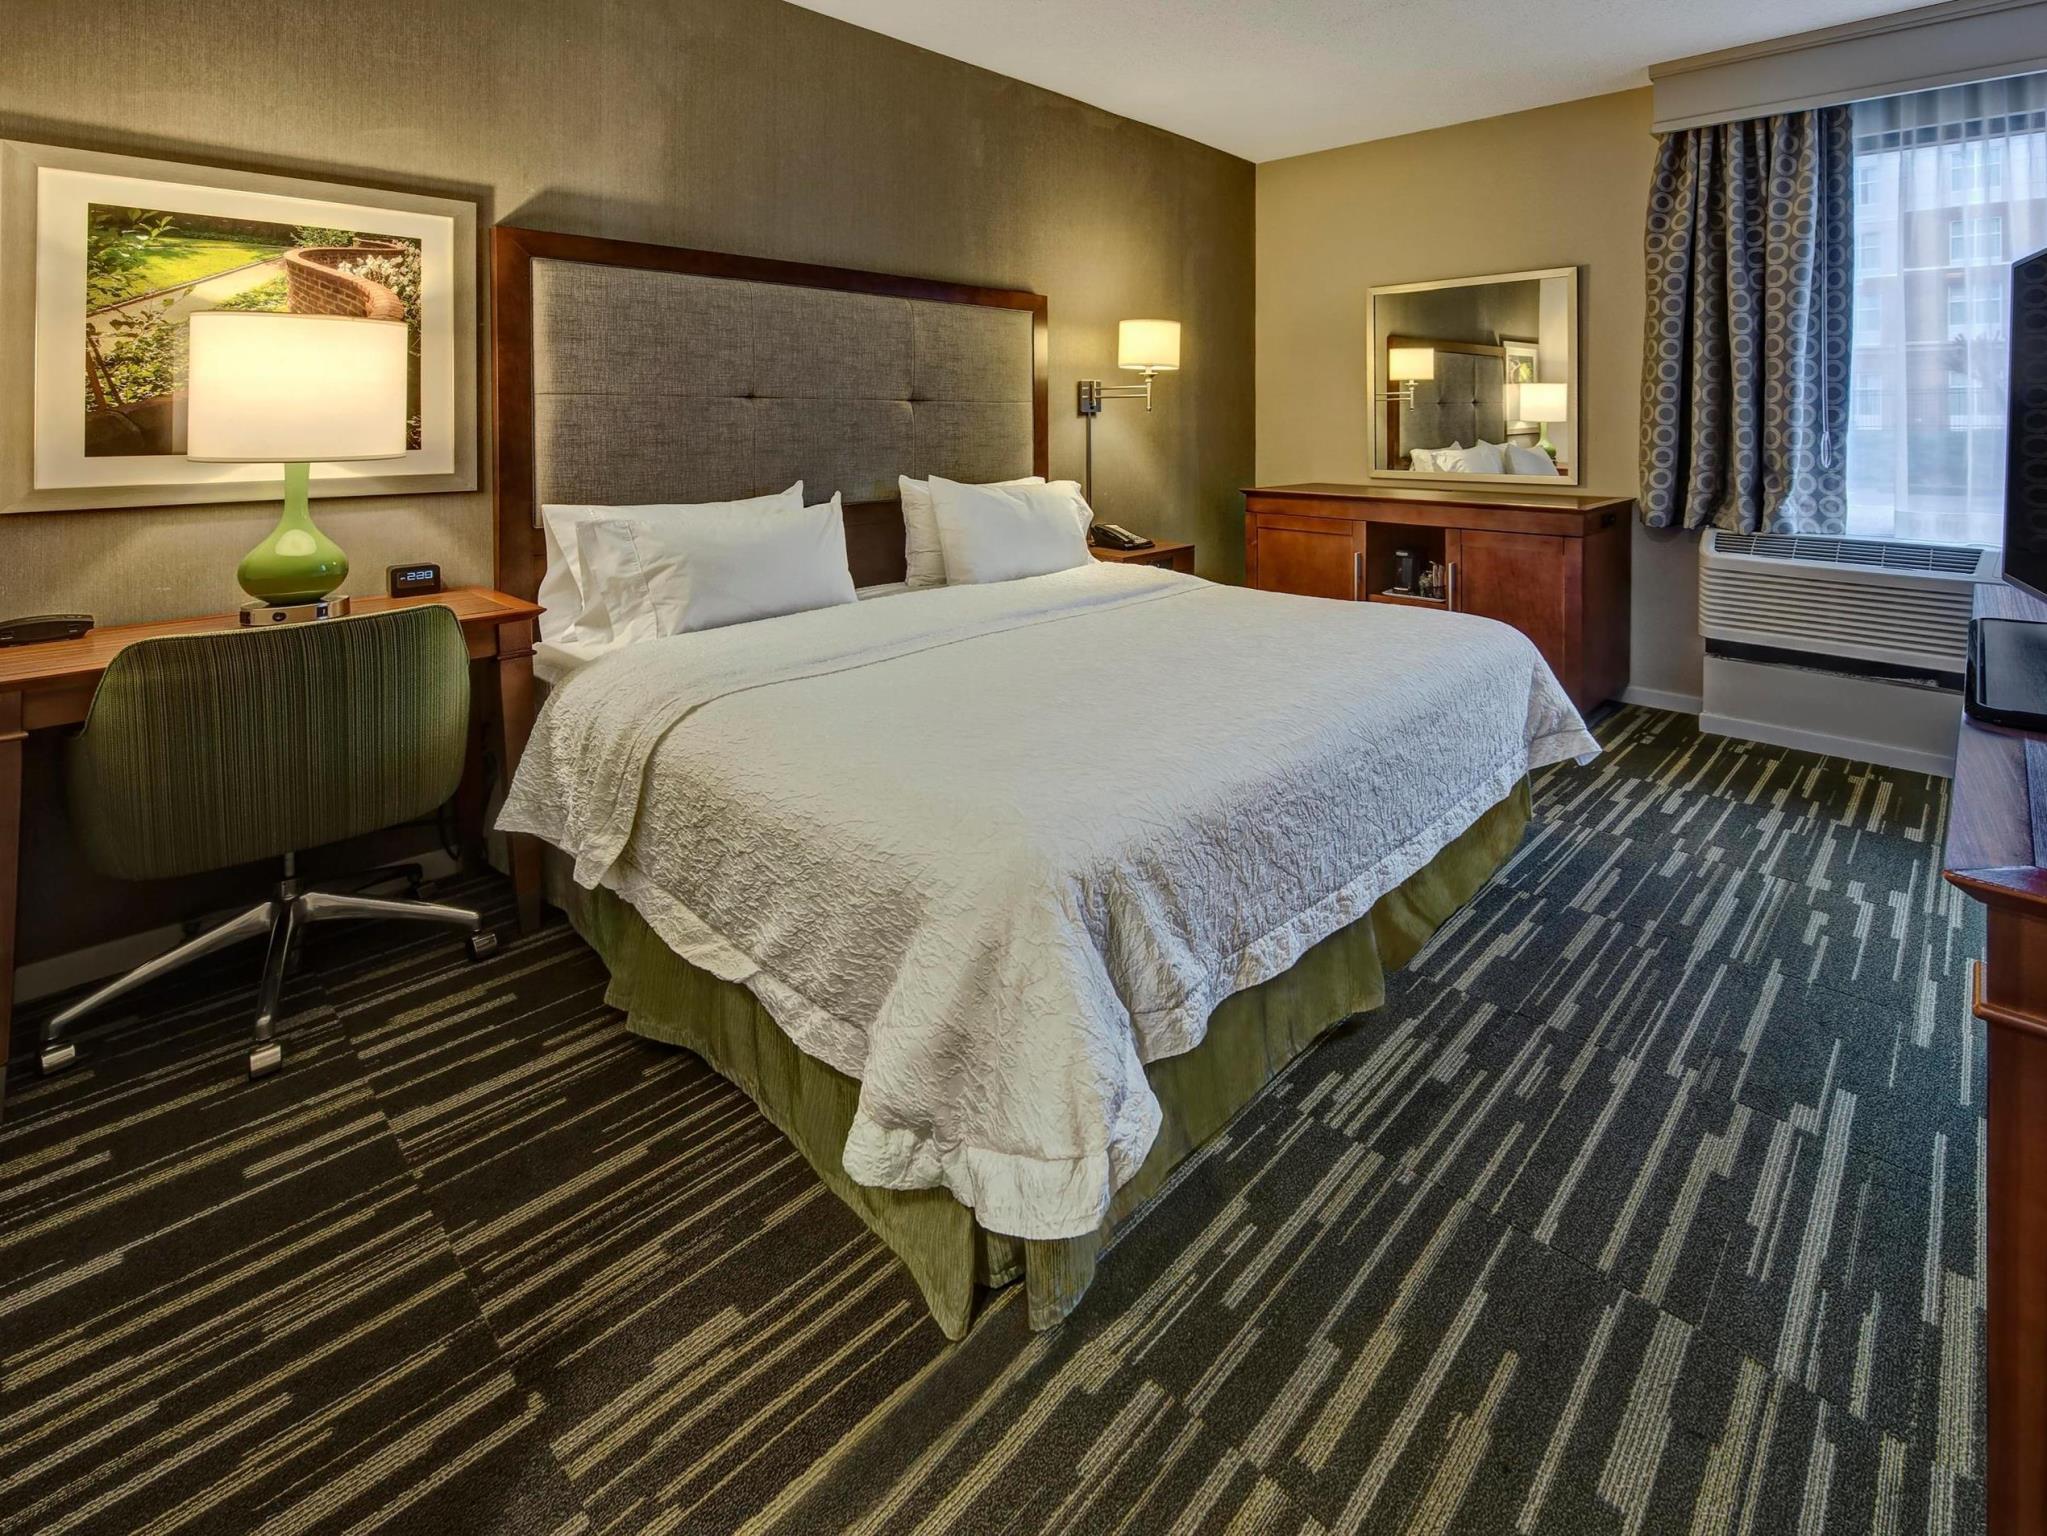 hampton inn charlottesville in charlottesville va room. Black Bedroom Furniture Sets. Home Design Ideas